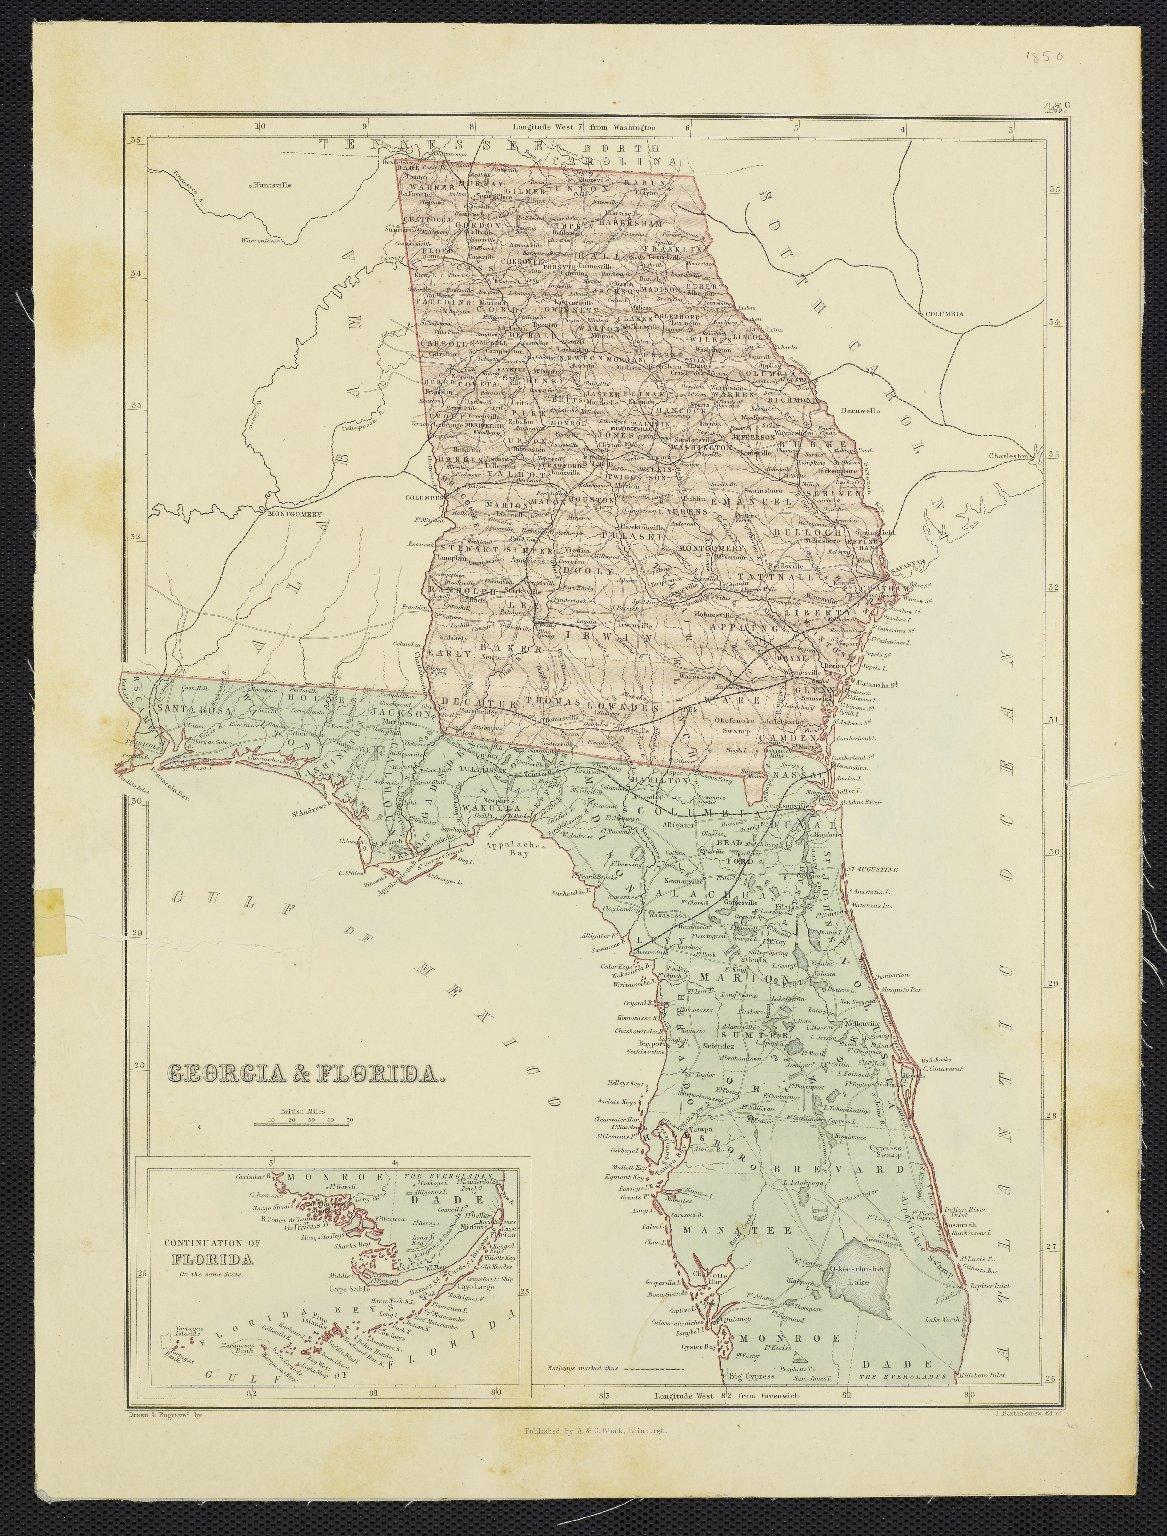 Georgia & Florida